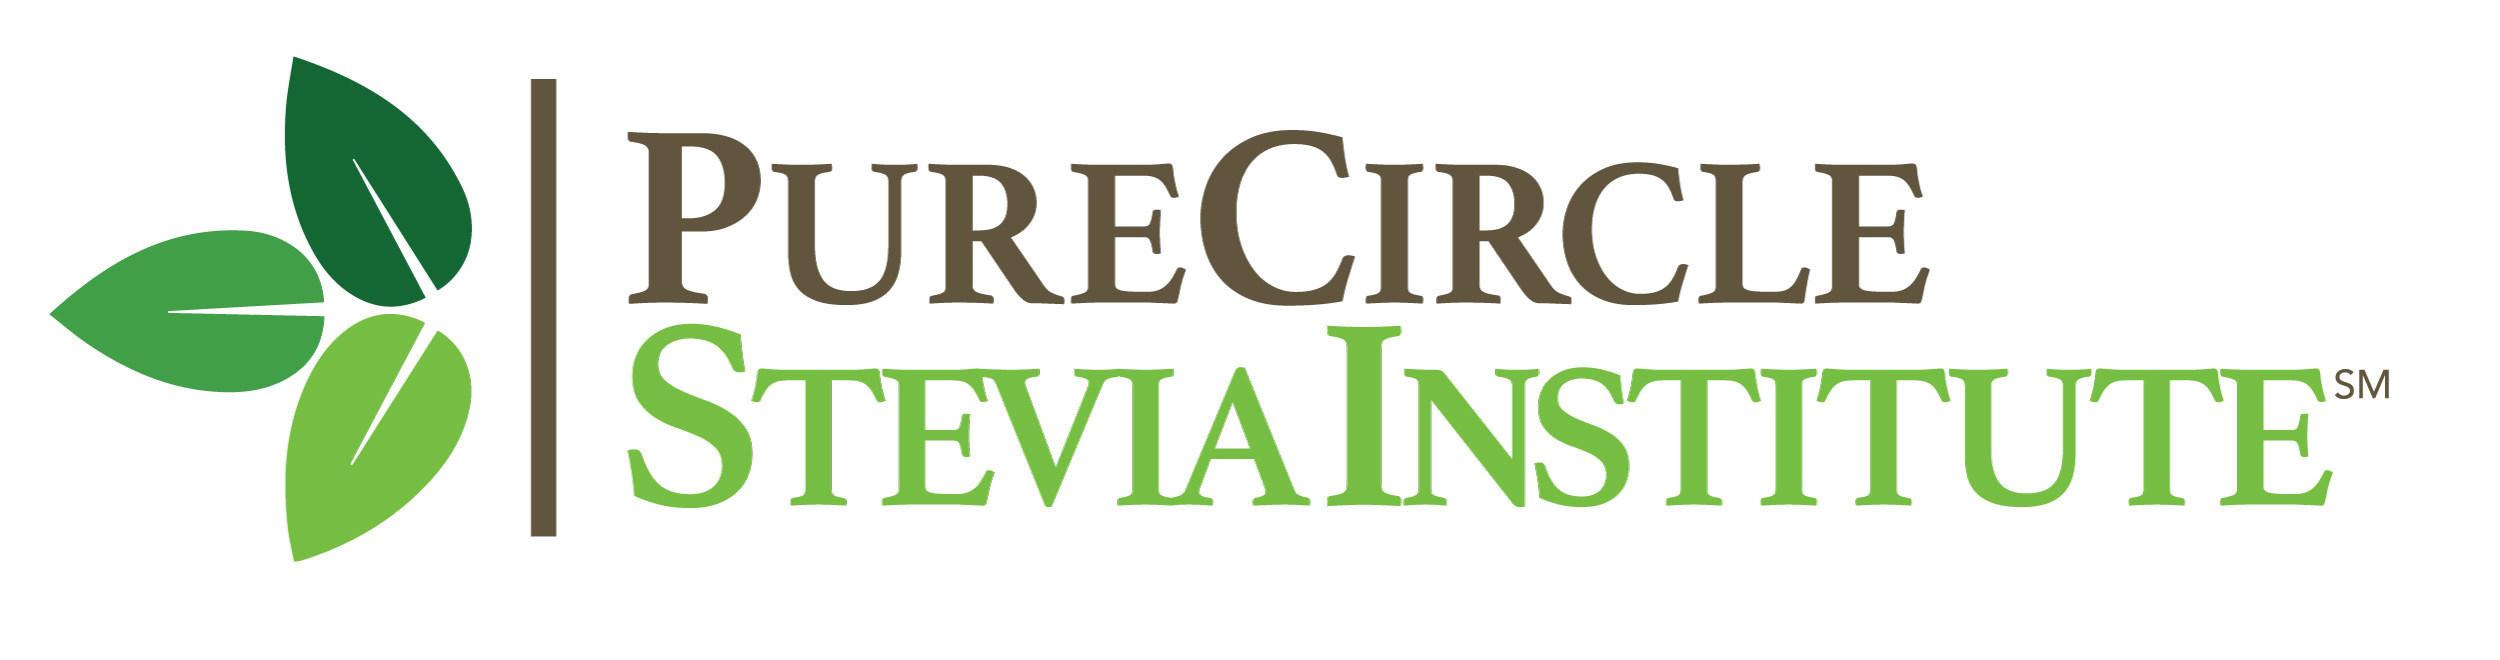 PureCircle Stevia Institute logo